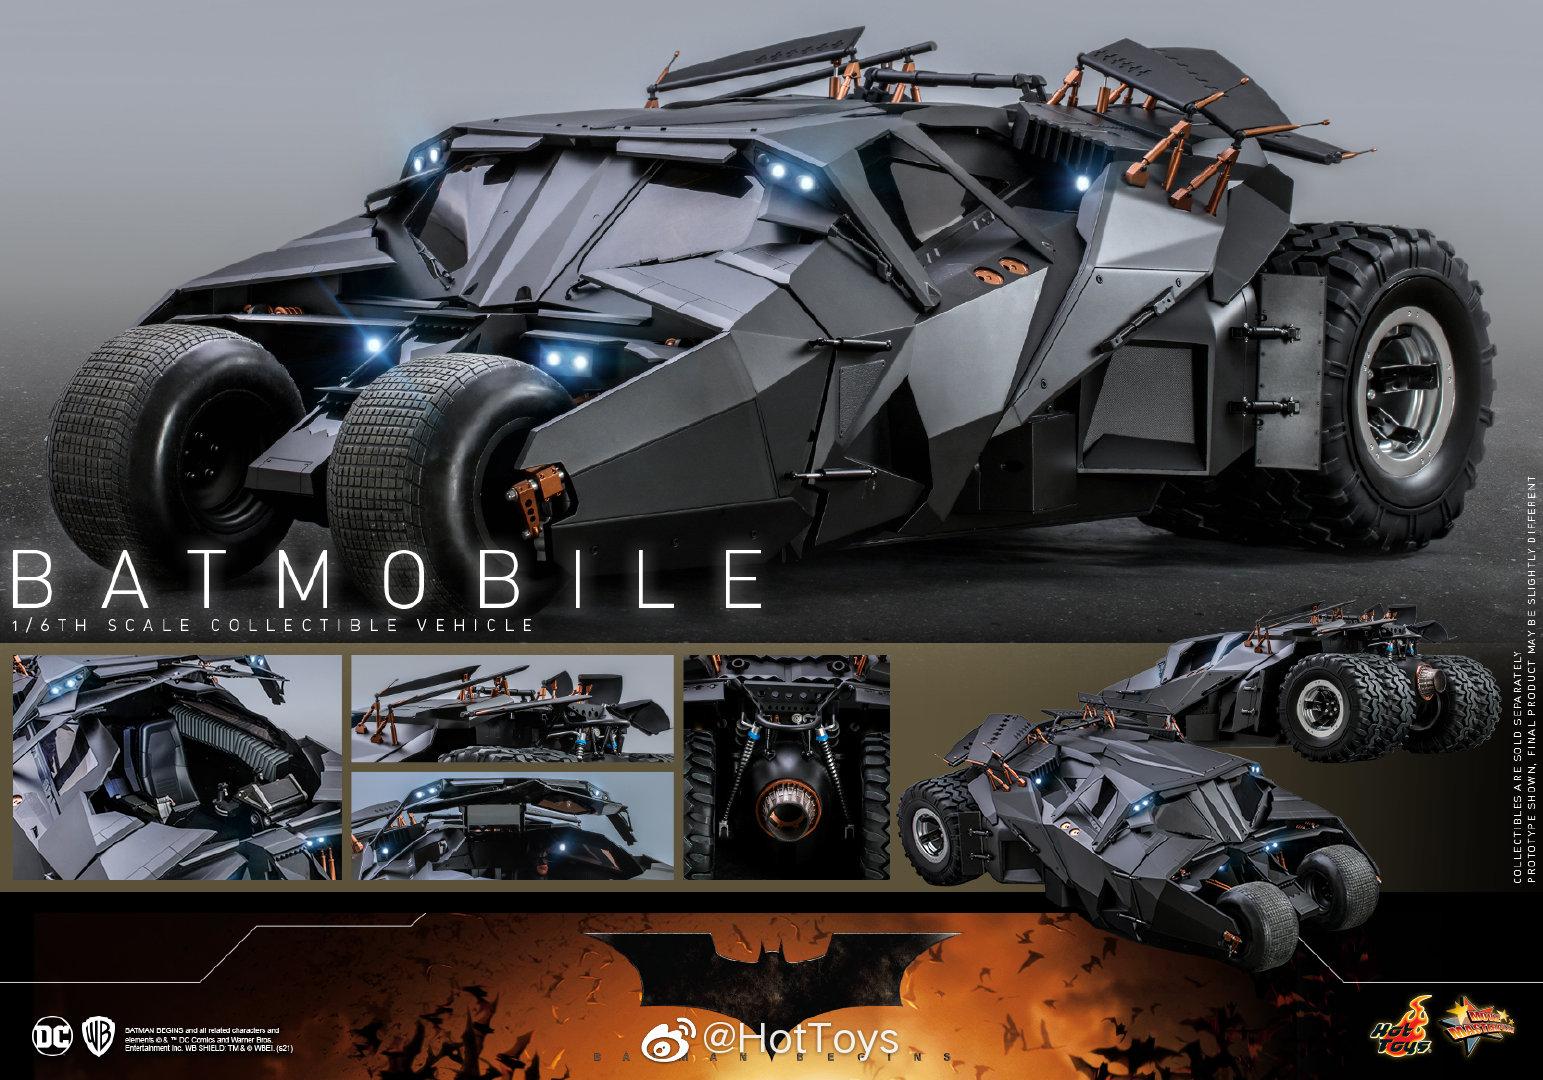 Hottoys诺兰版蝙蝠车1/6模型 售价3980元